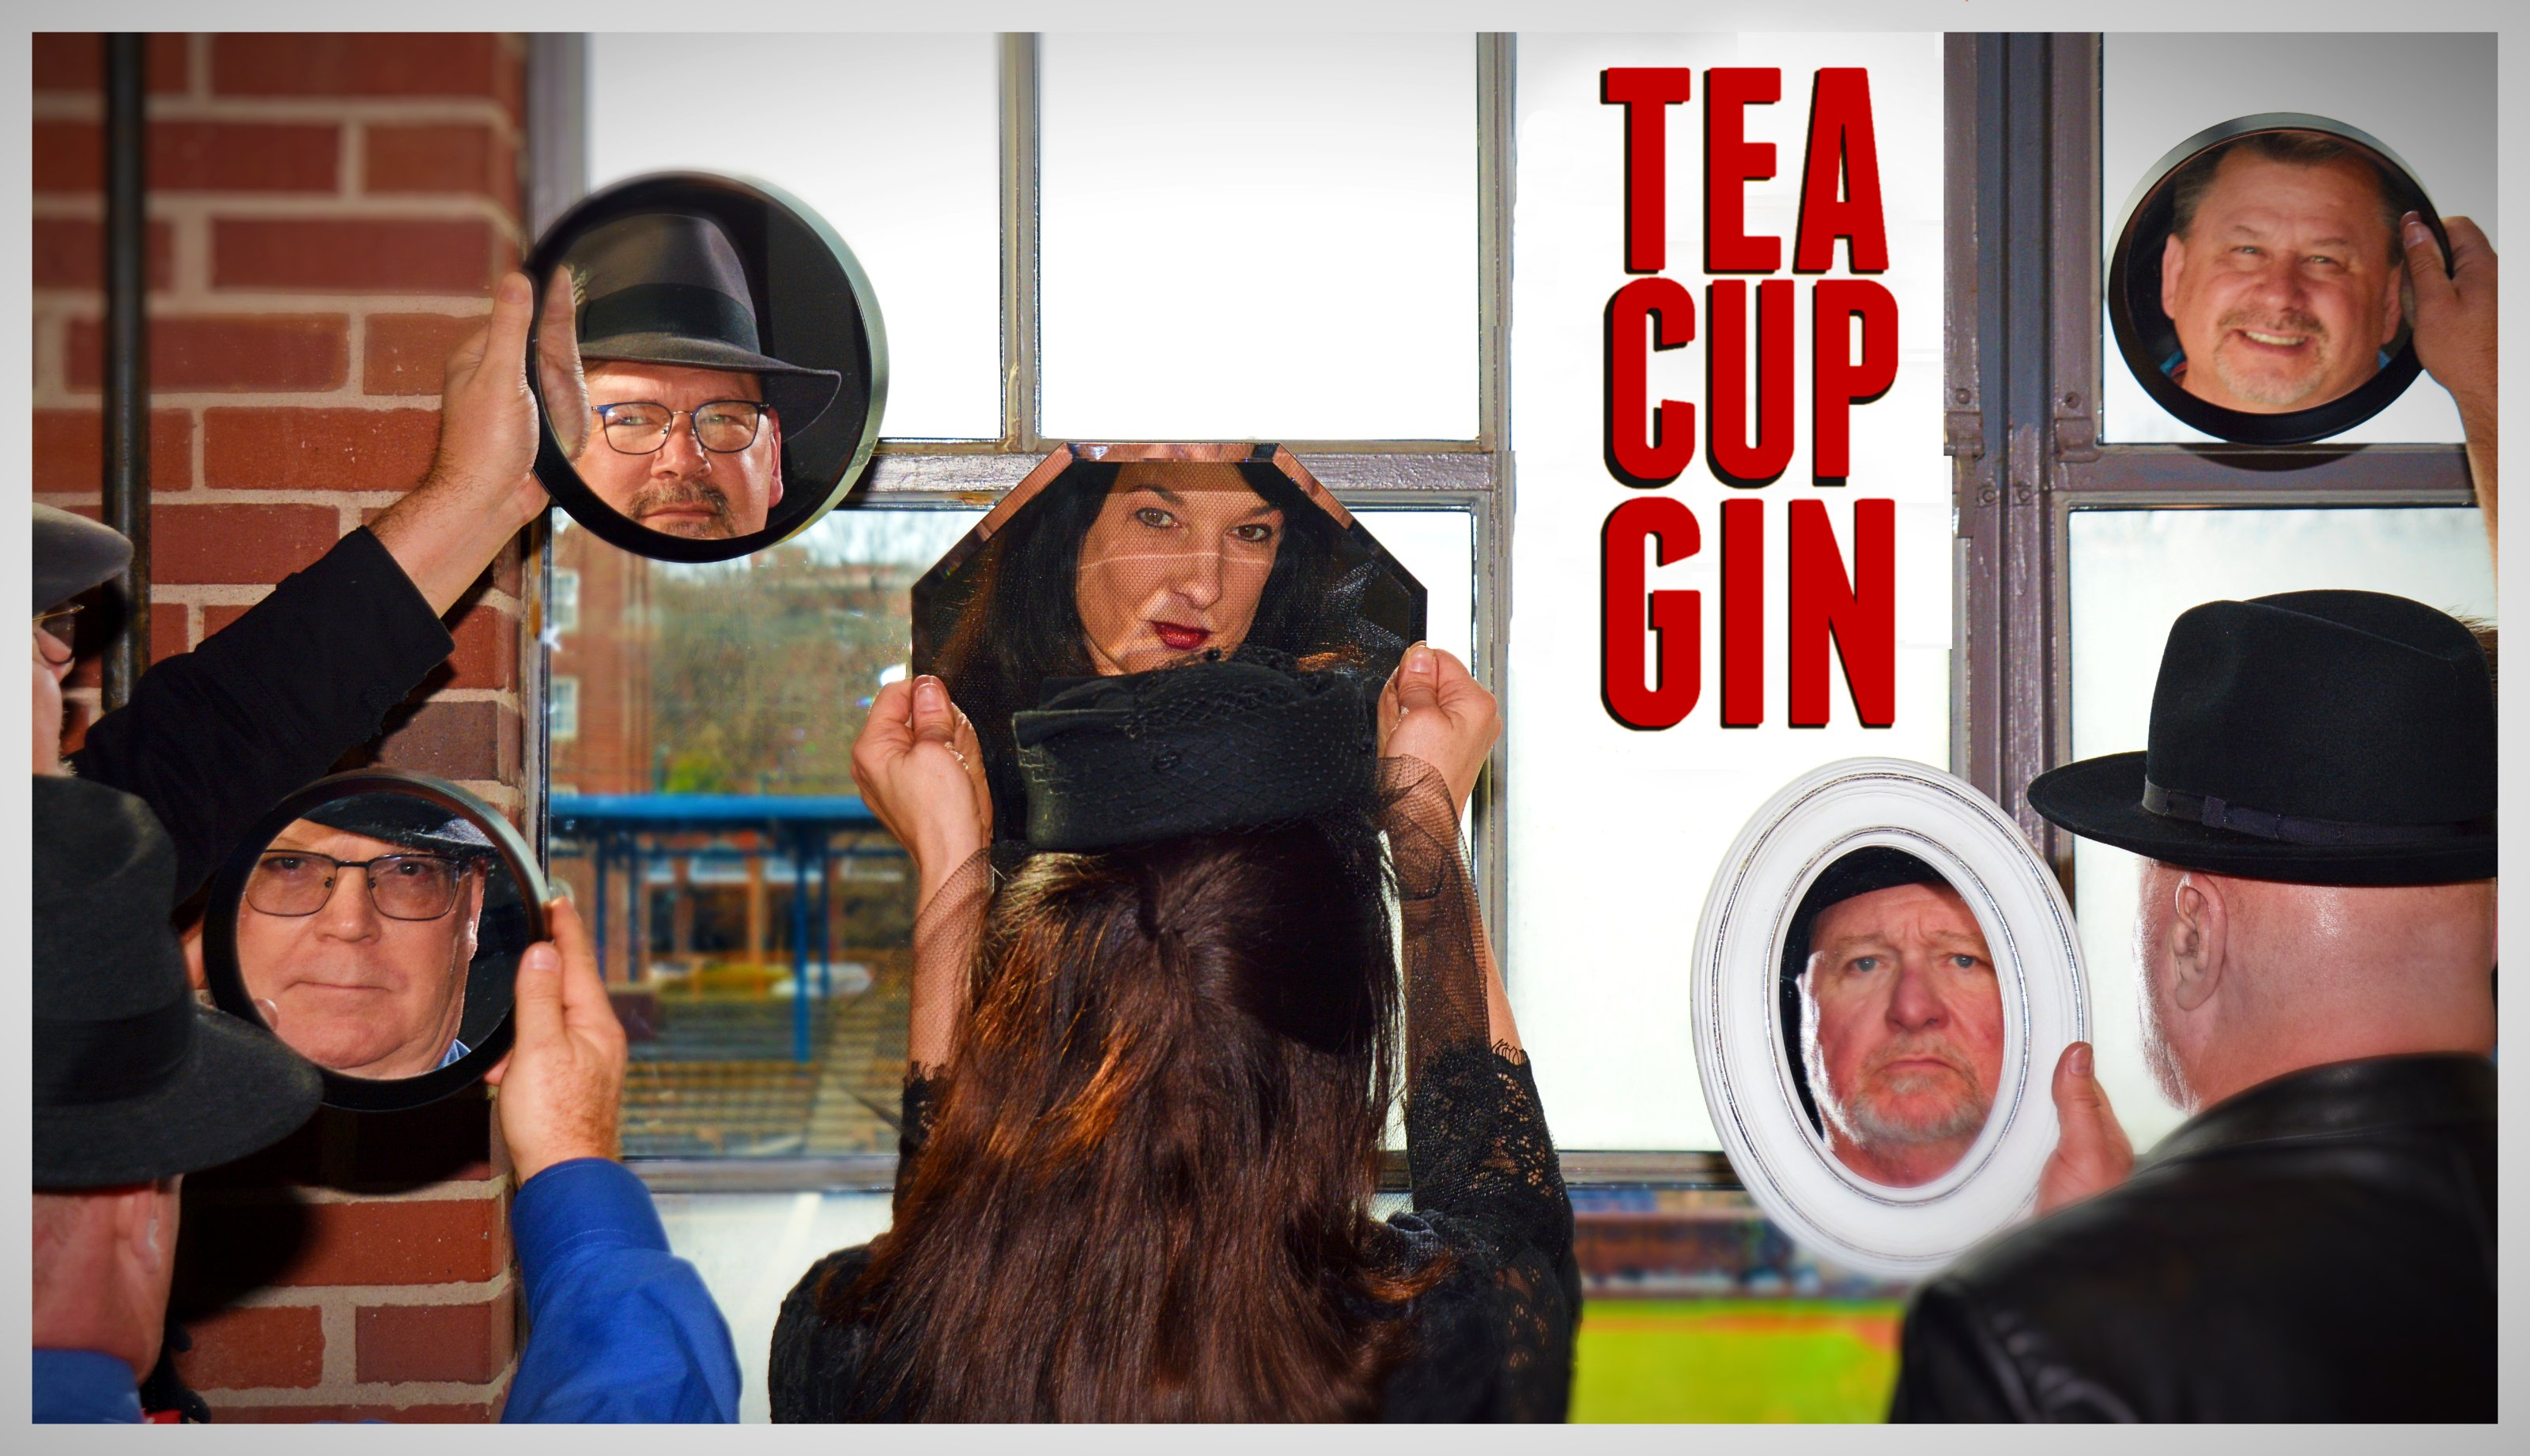 Tea Cup Gin! (Mark, JohnK, ChristyB, MikeR, MikeC)